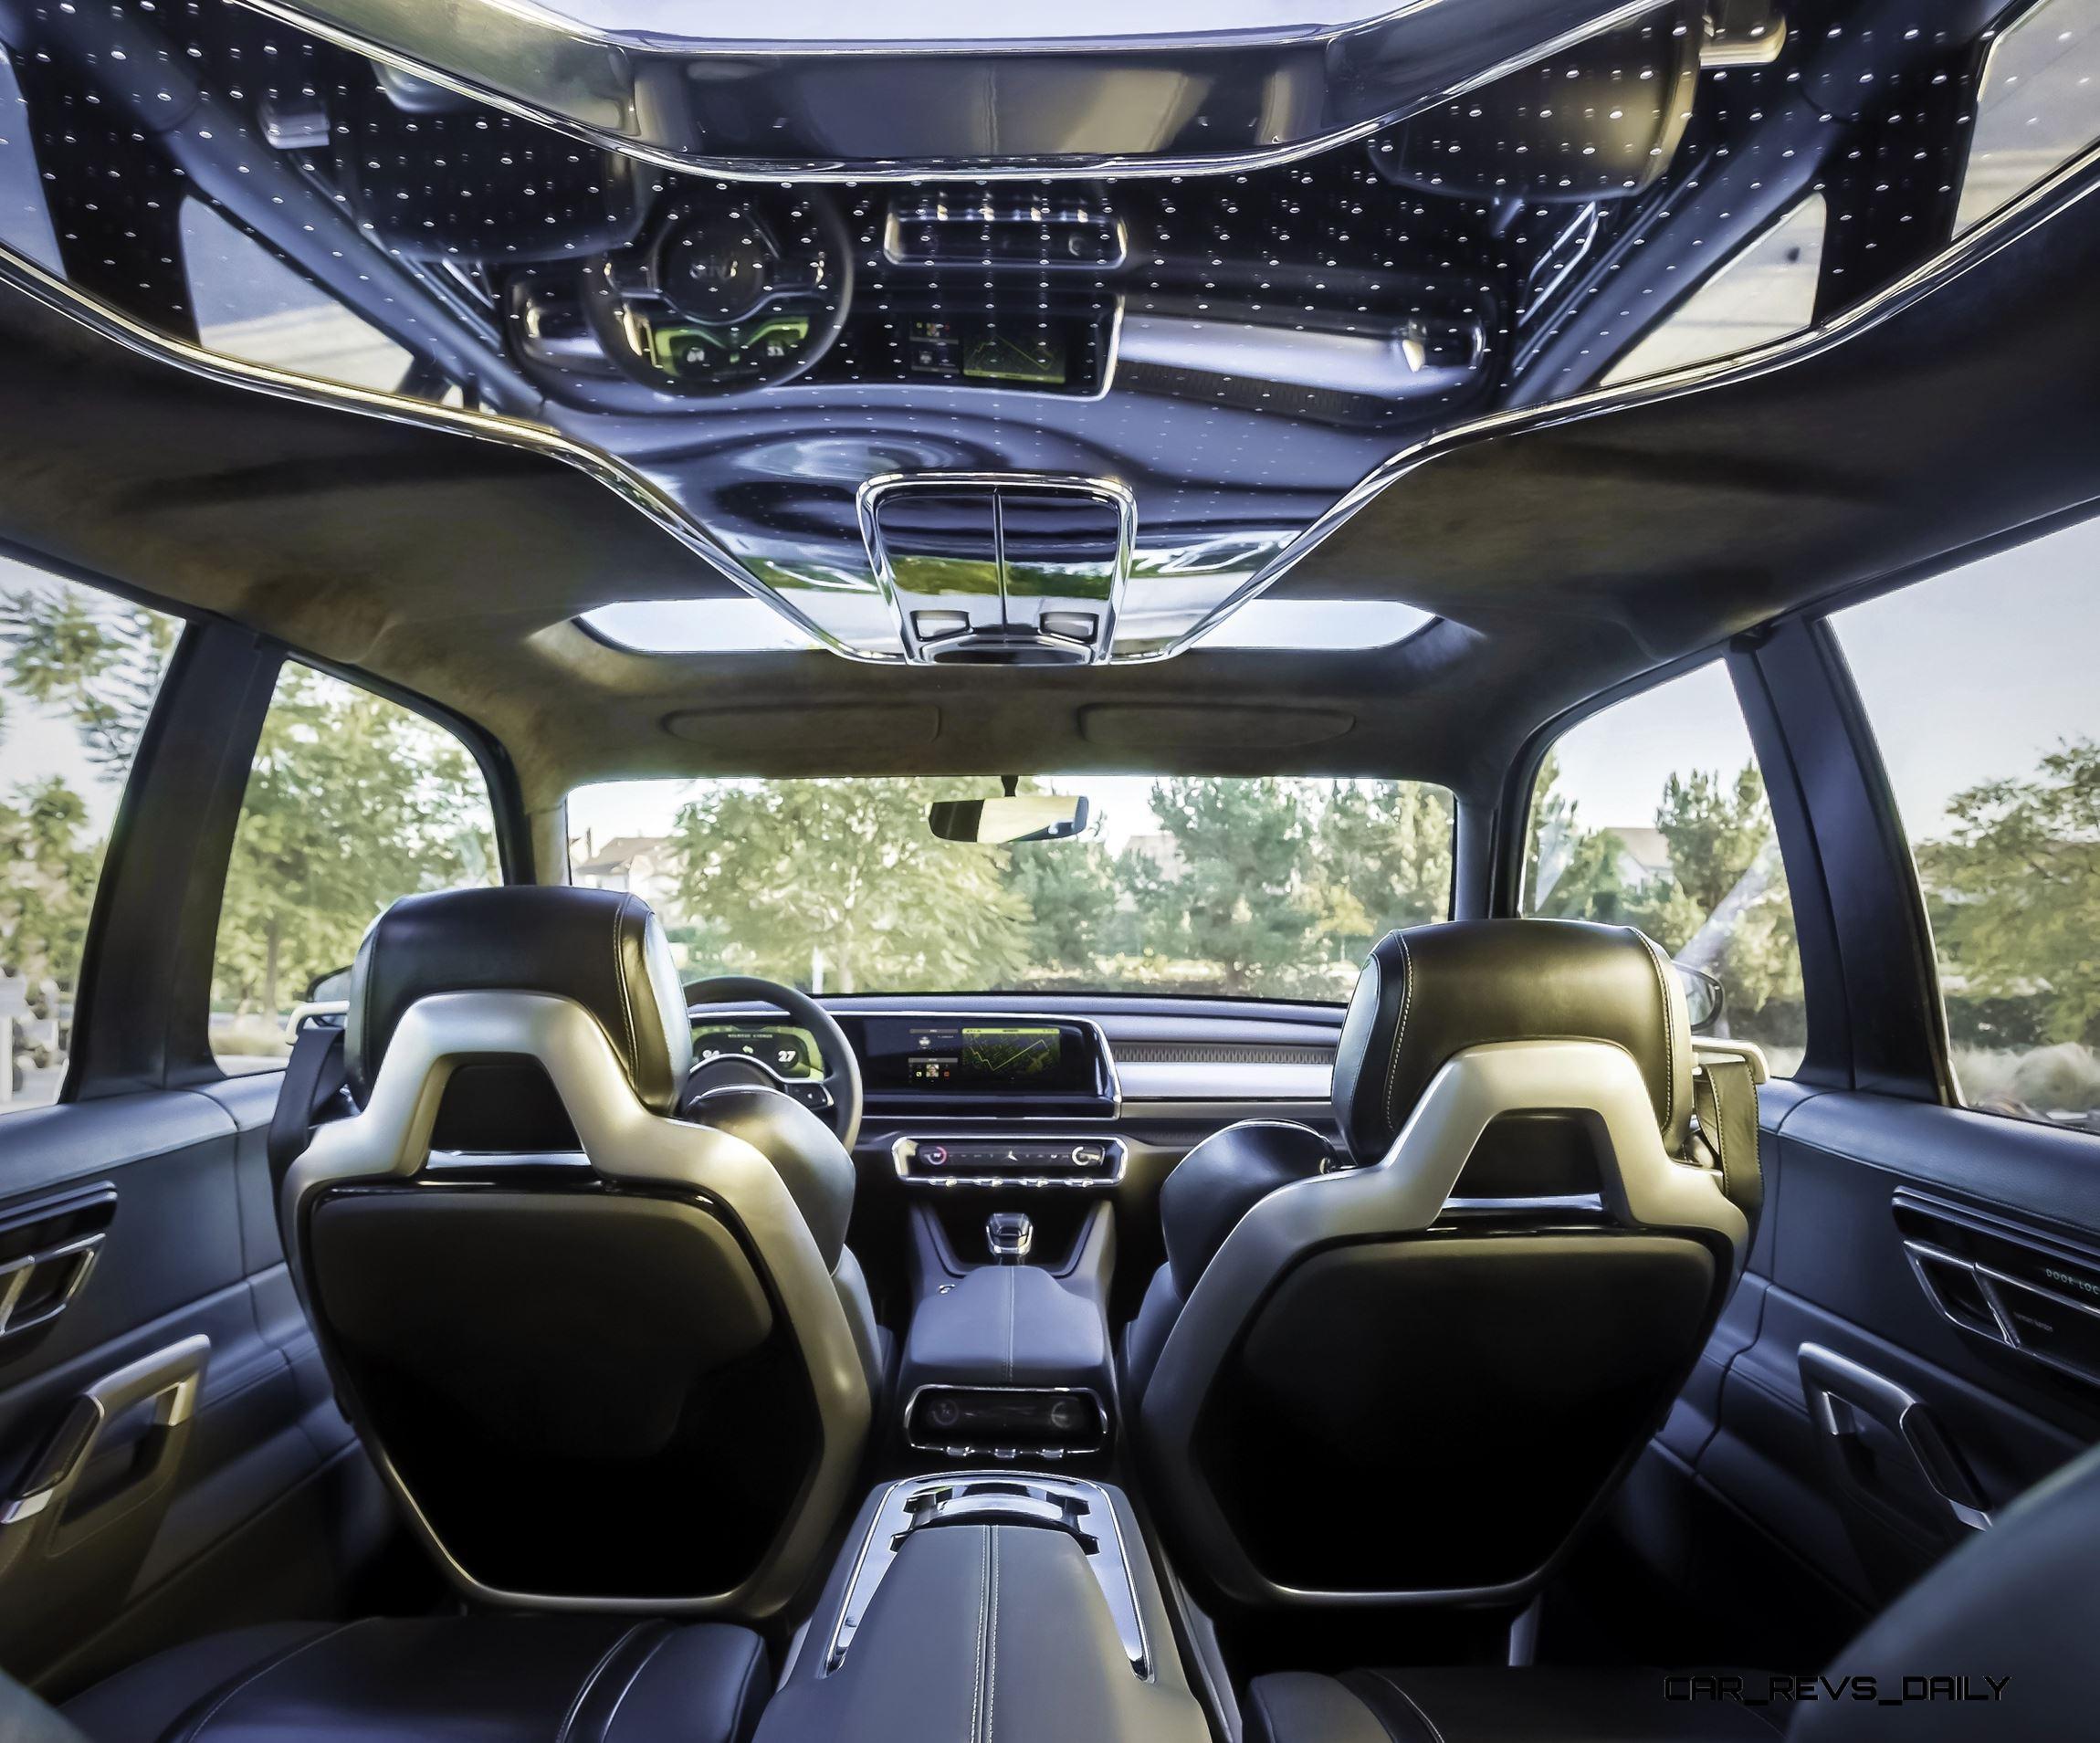 7 Passenger Suv >> 2016 Kia TELLURIDE Concept - LWB SUV Brings 7-Seat Chalet ...